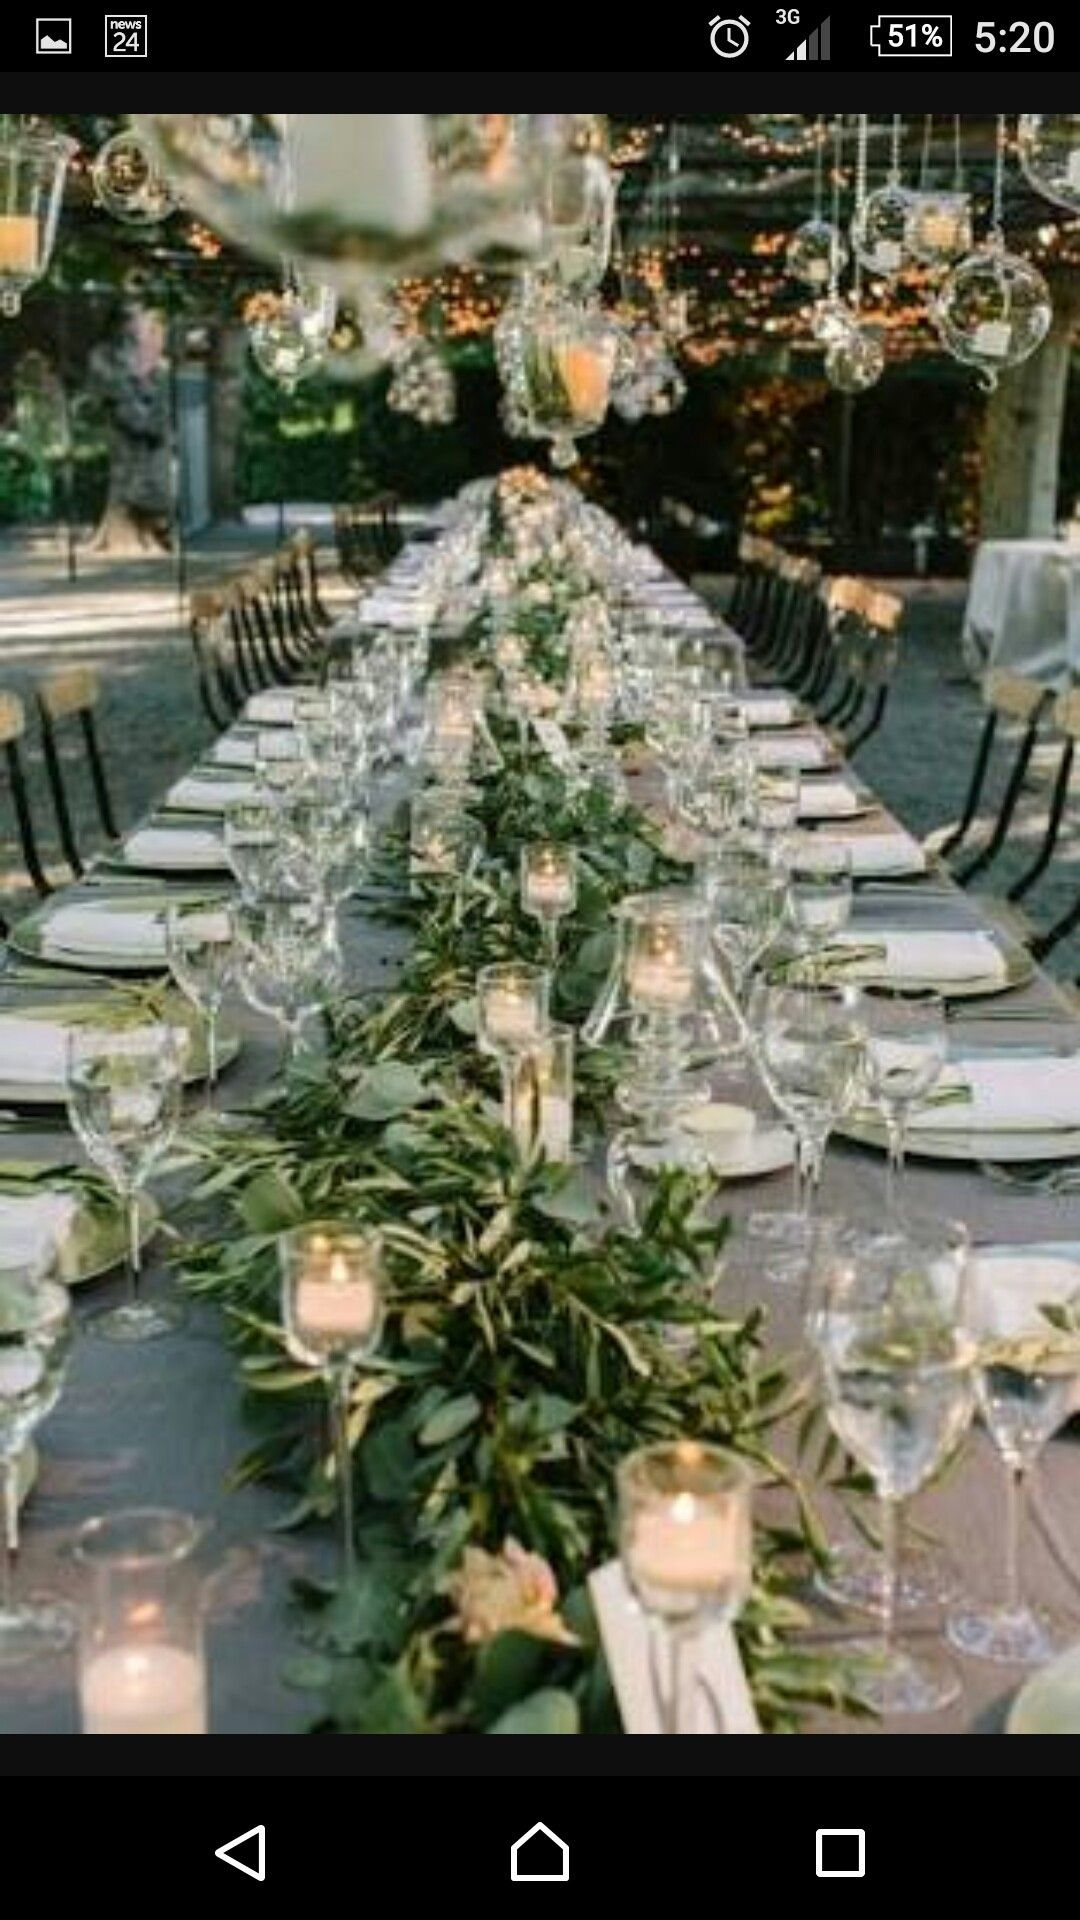 Pin by kayla Esterhuizen on wedding | Pinterest | Wedding, Weddings ...